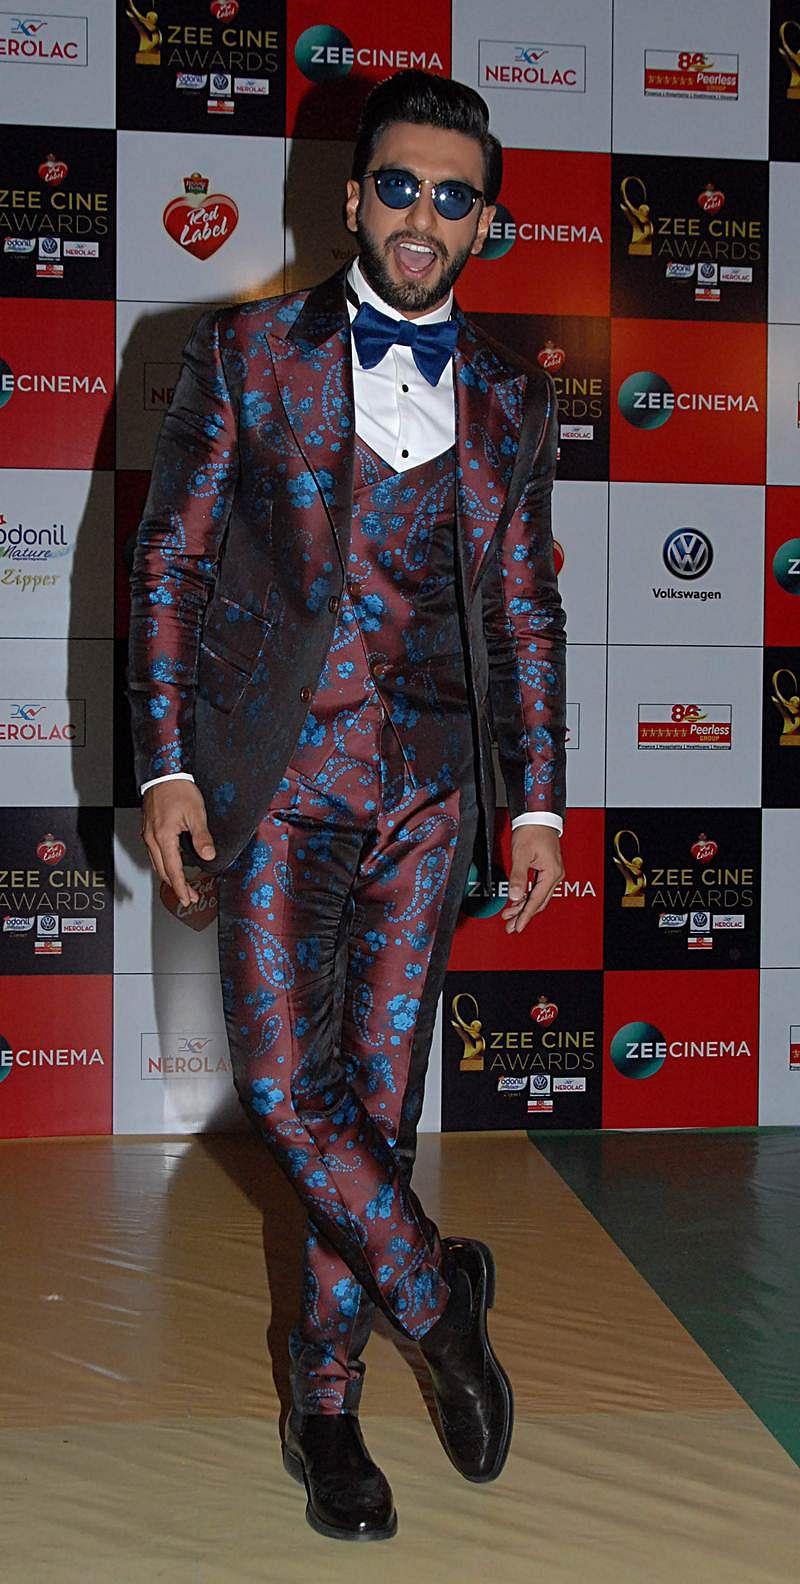 Ranveer Singh attends the 'Zee Cine Awards 2018' ceremony in Mumbai on December 19, 2017. / AFP PHOTO / Sujit Jaiswal